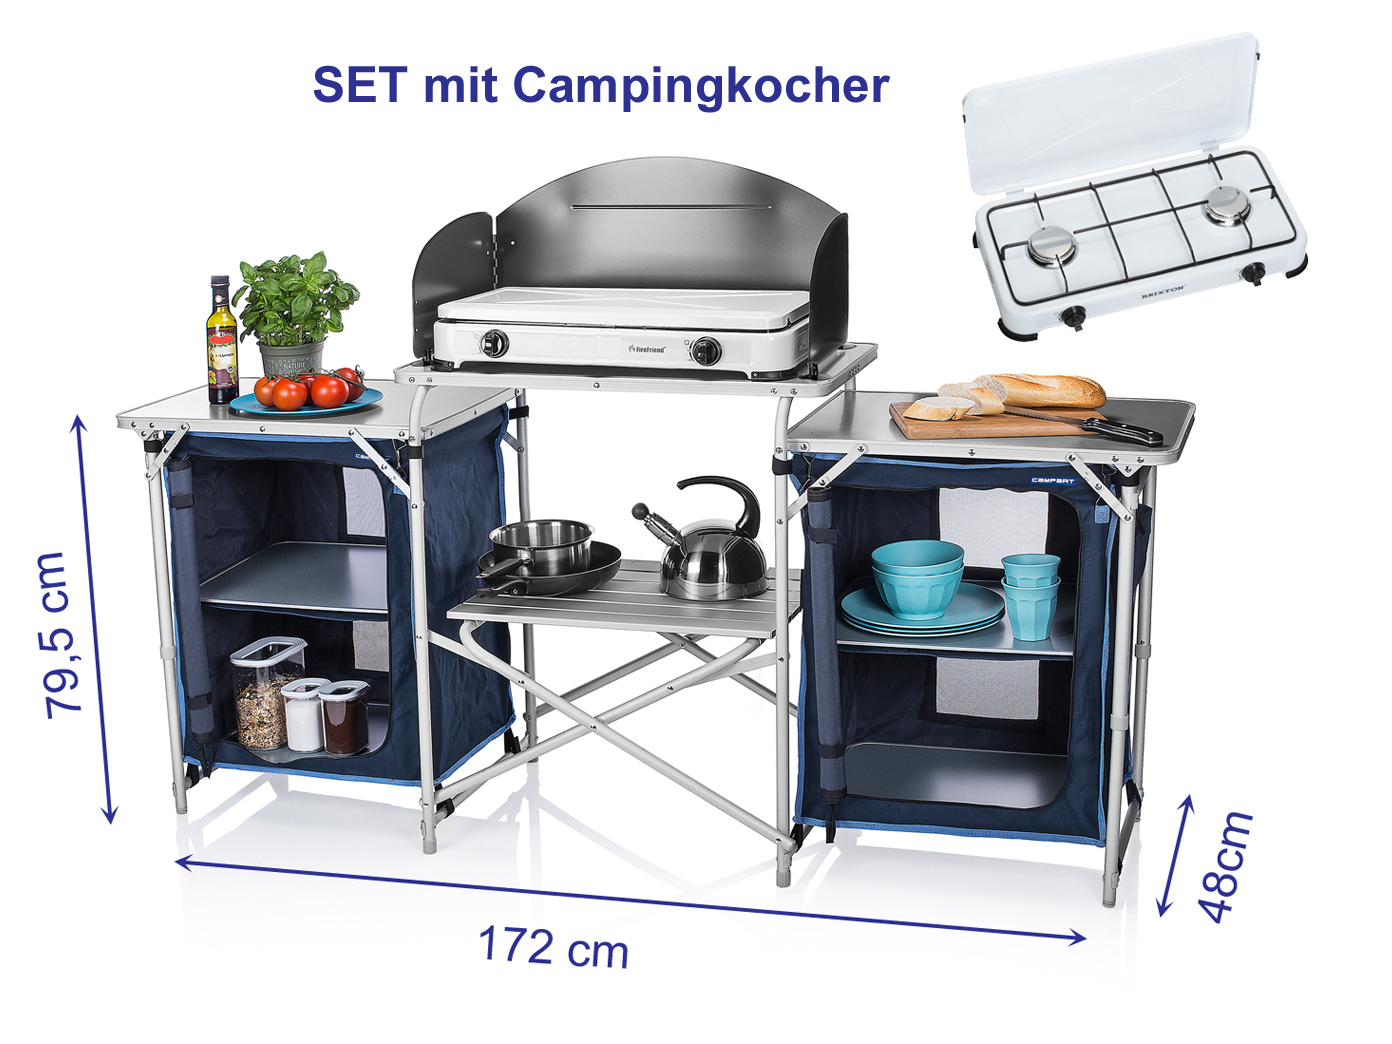 Outdoor Küche Edelstahl Xxl : Xxl campingküche faltbar set mit gaskocher outdoor camping küche